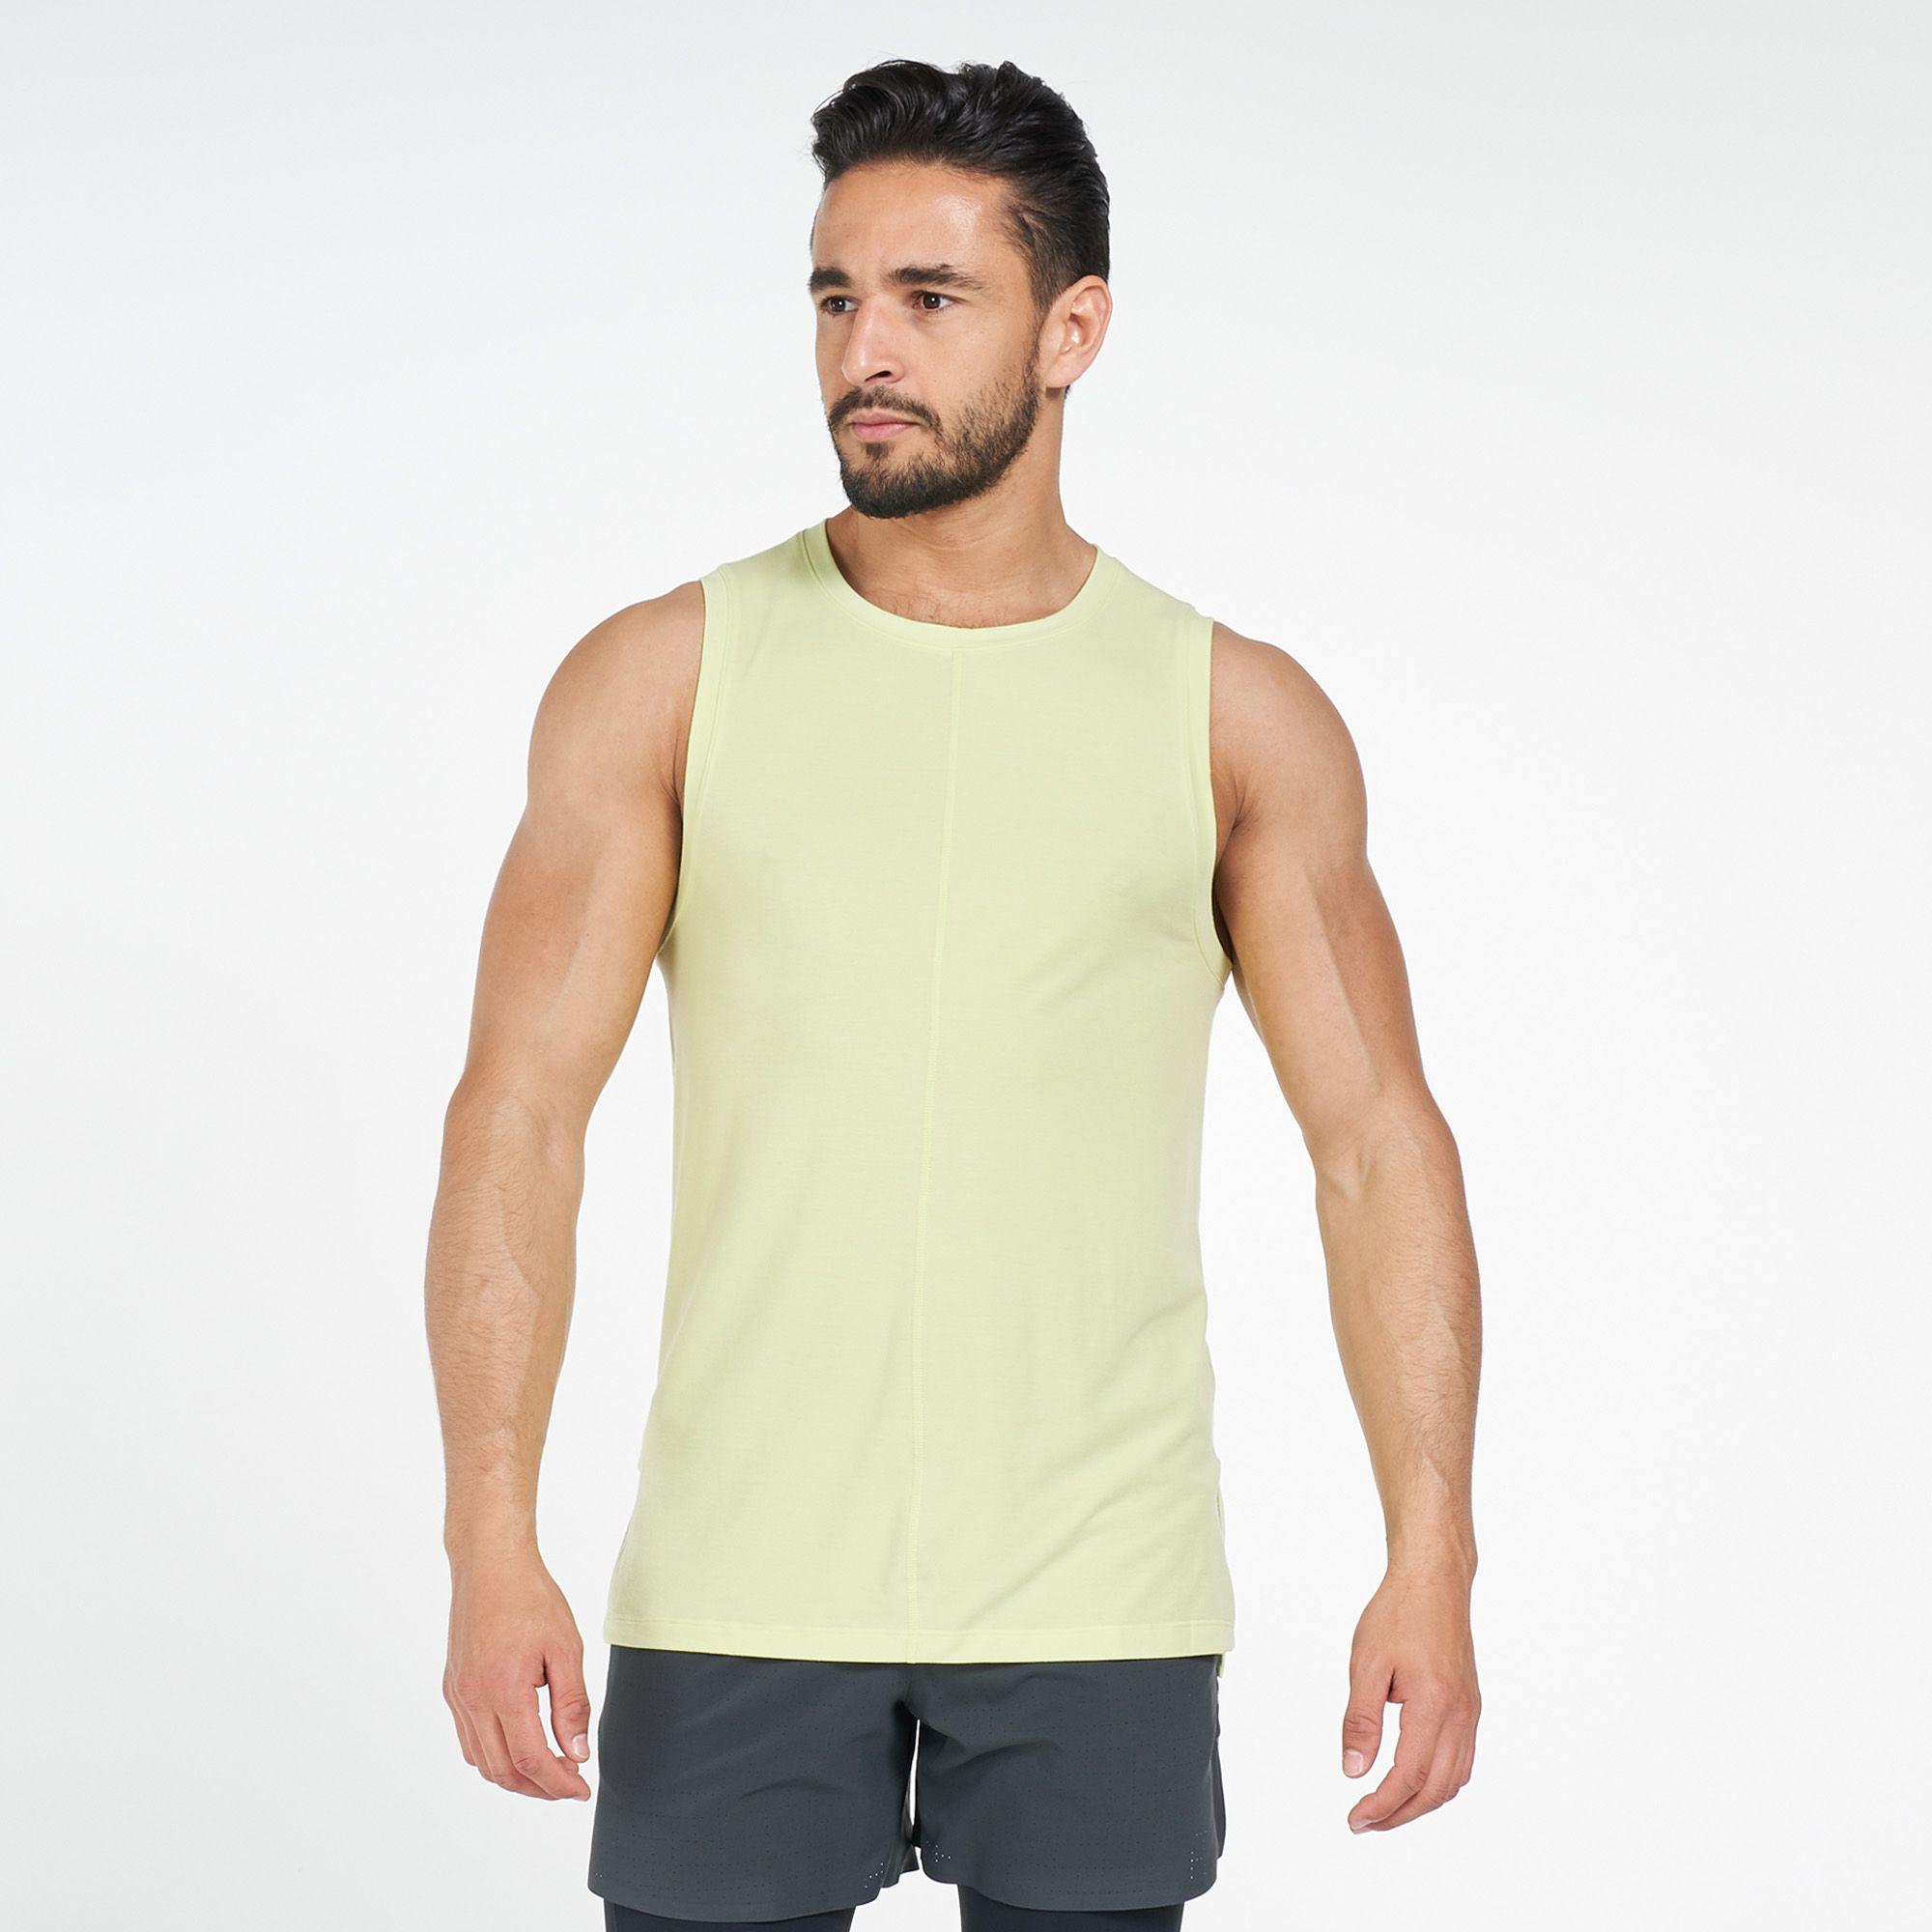 Nike Men S Dri Fit Yoga Tank Top Tank Tops Tops Clothing Men S Sale Sale Sss